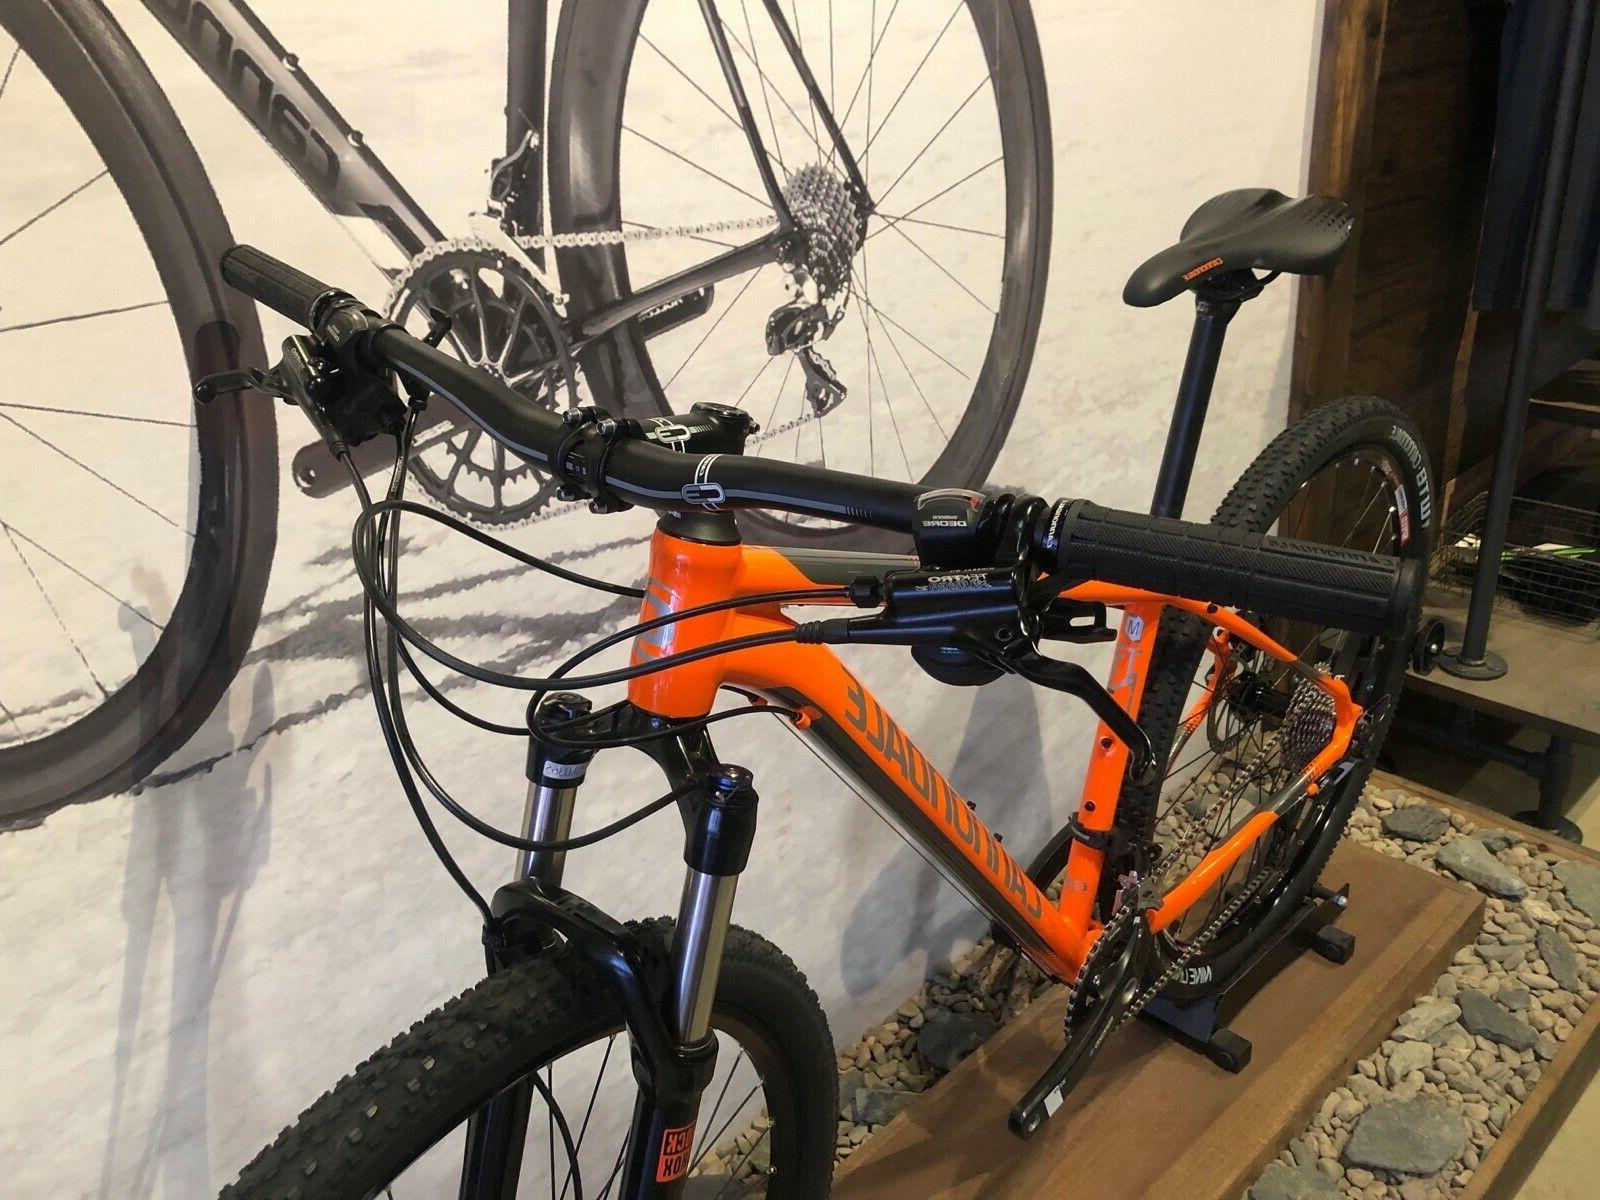 2017 Cannondale Trail 29' MTB - New, Hazard